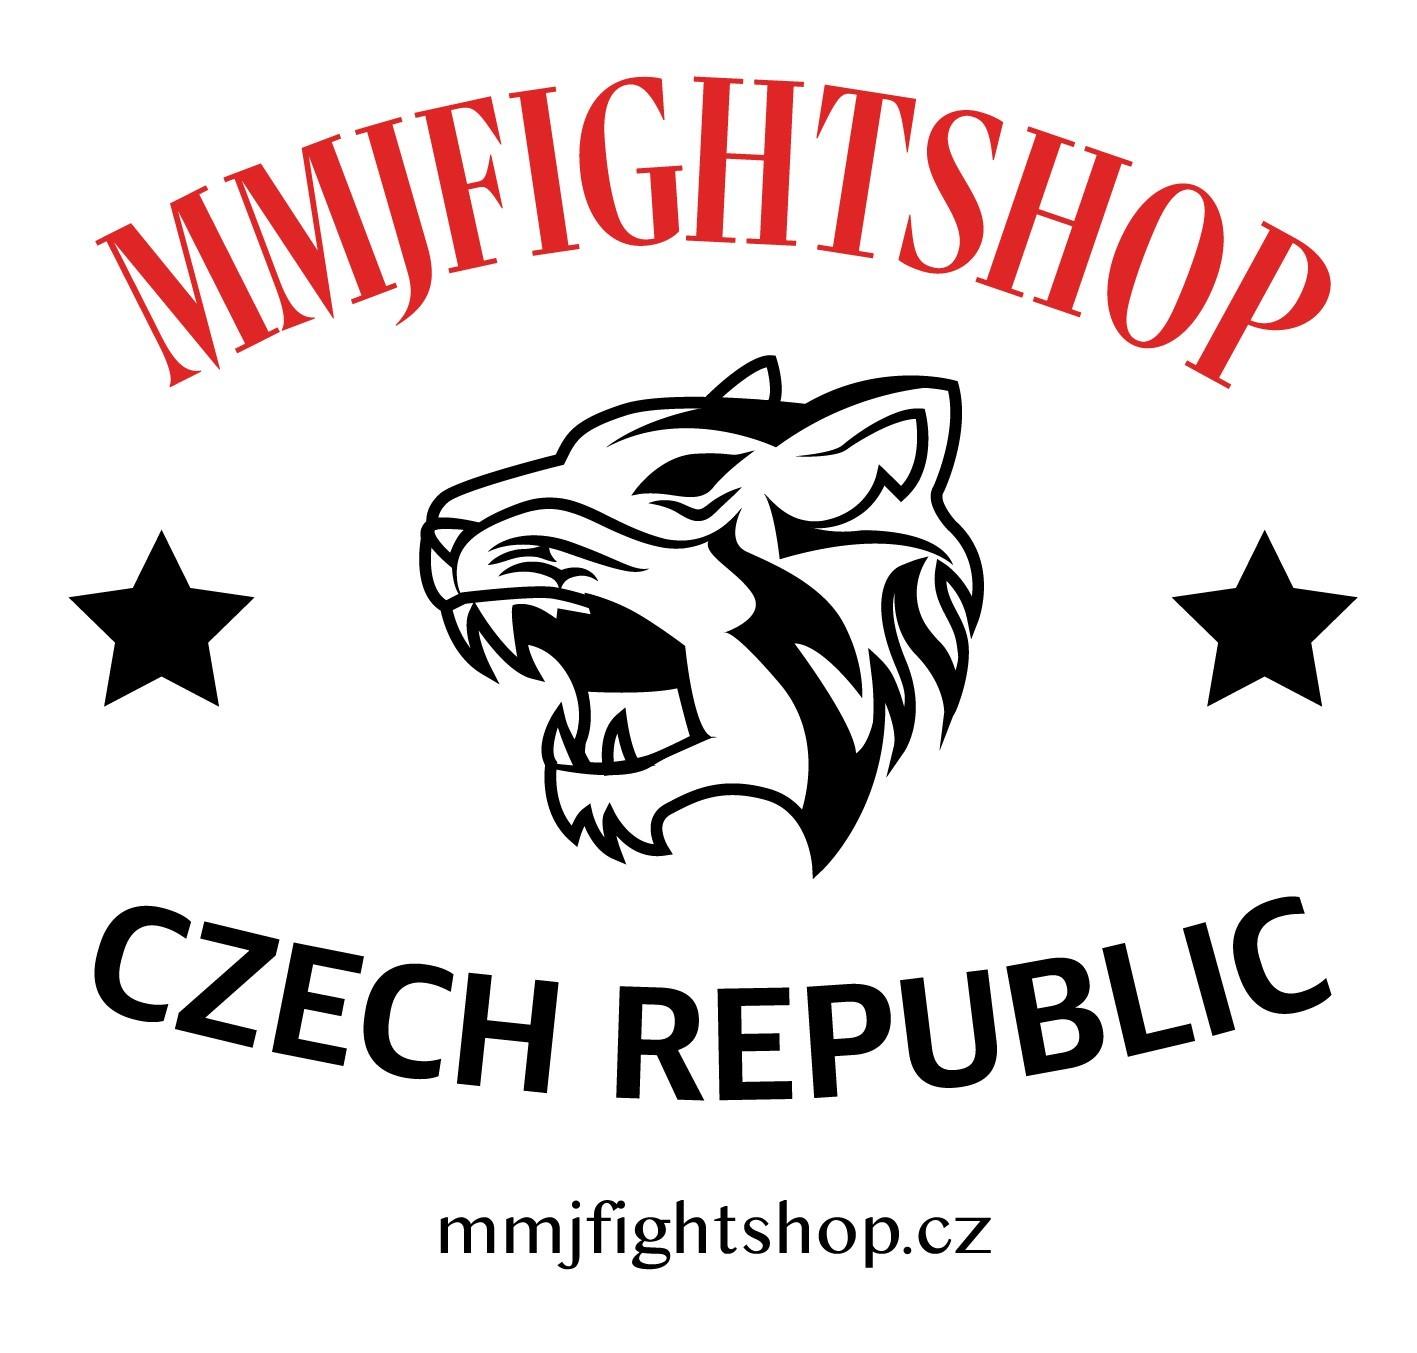 MMJ Fight Shop: Box, MMA, Muay Thai - MMJFIGHTSHOP.CZ - EUROPEAN DEALER